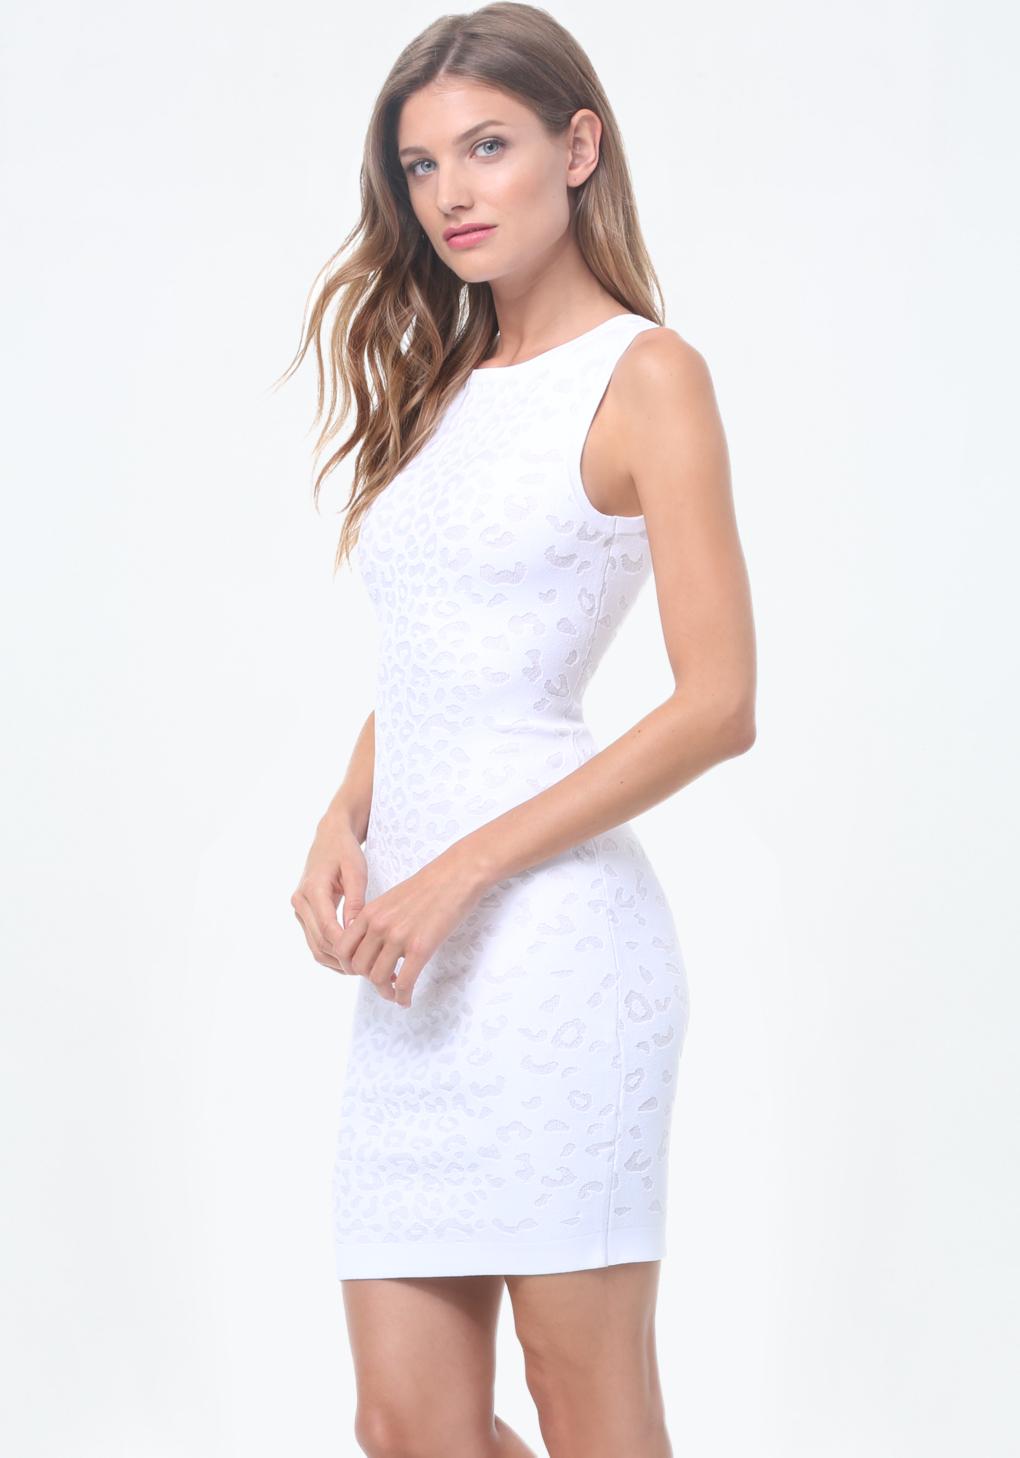 Lyst bebe leopard motif sweater dress in white for Bebe dresses wedding guest